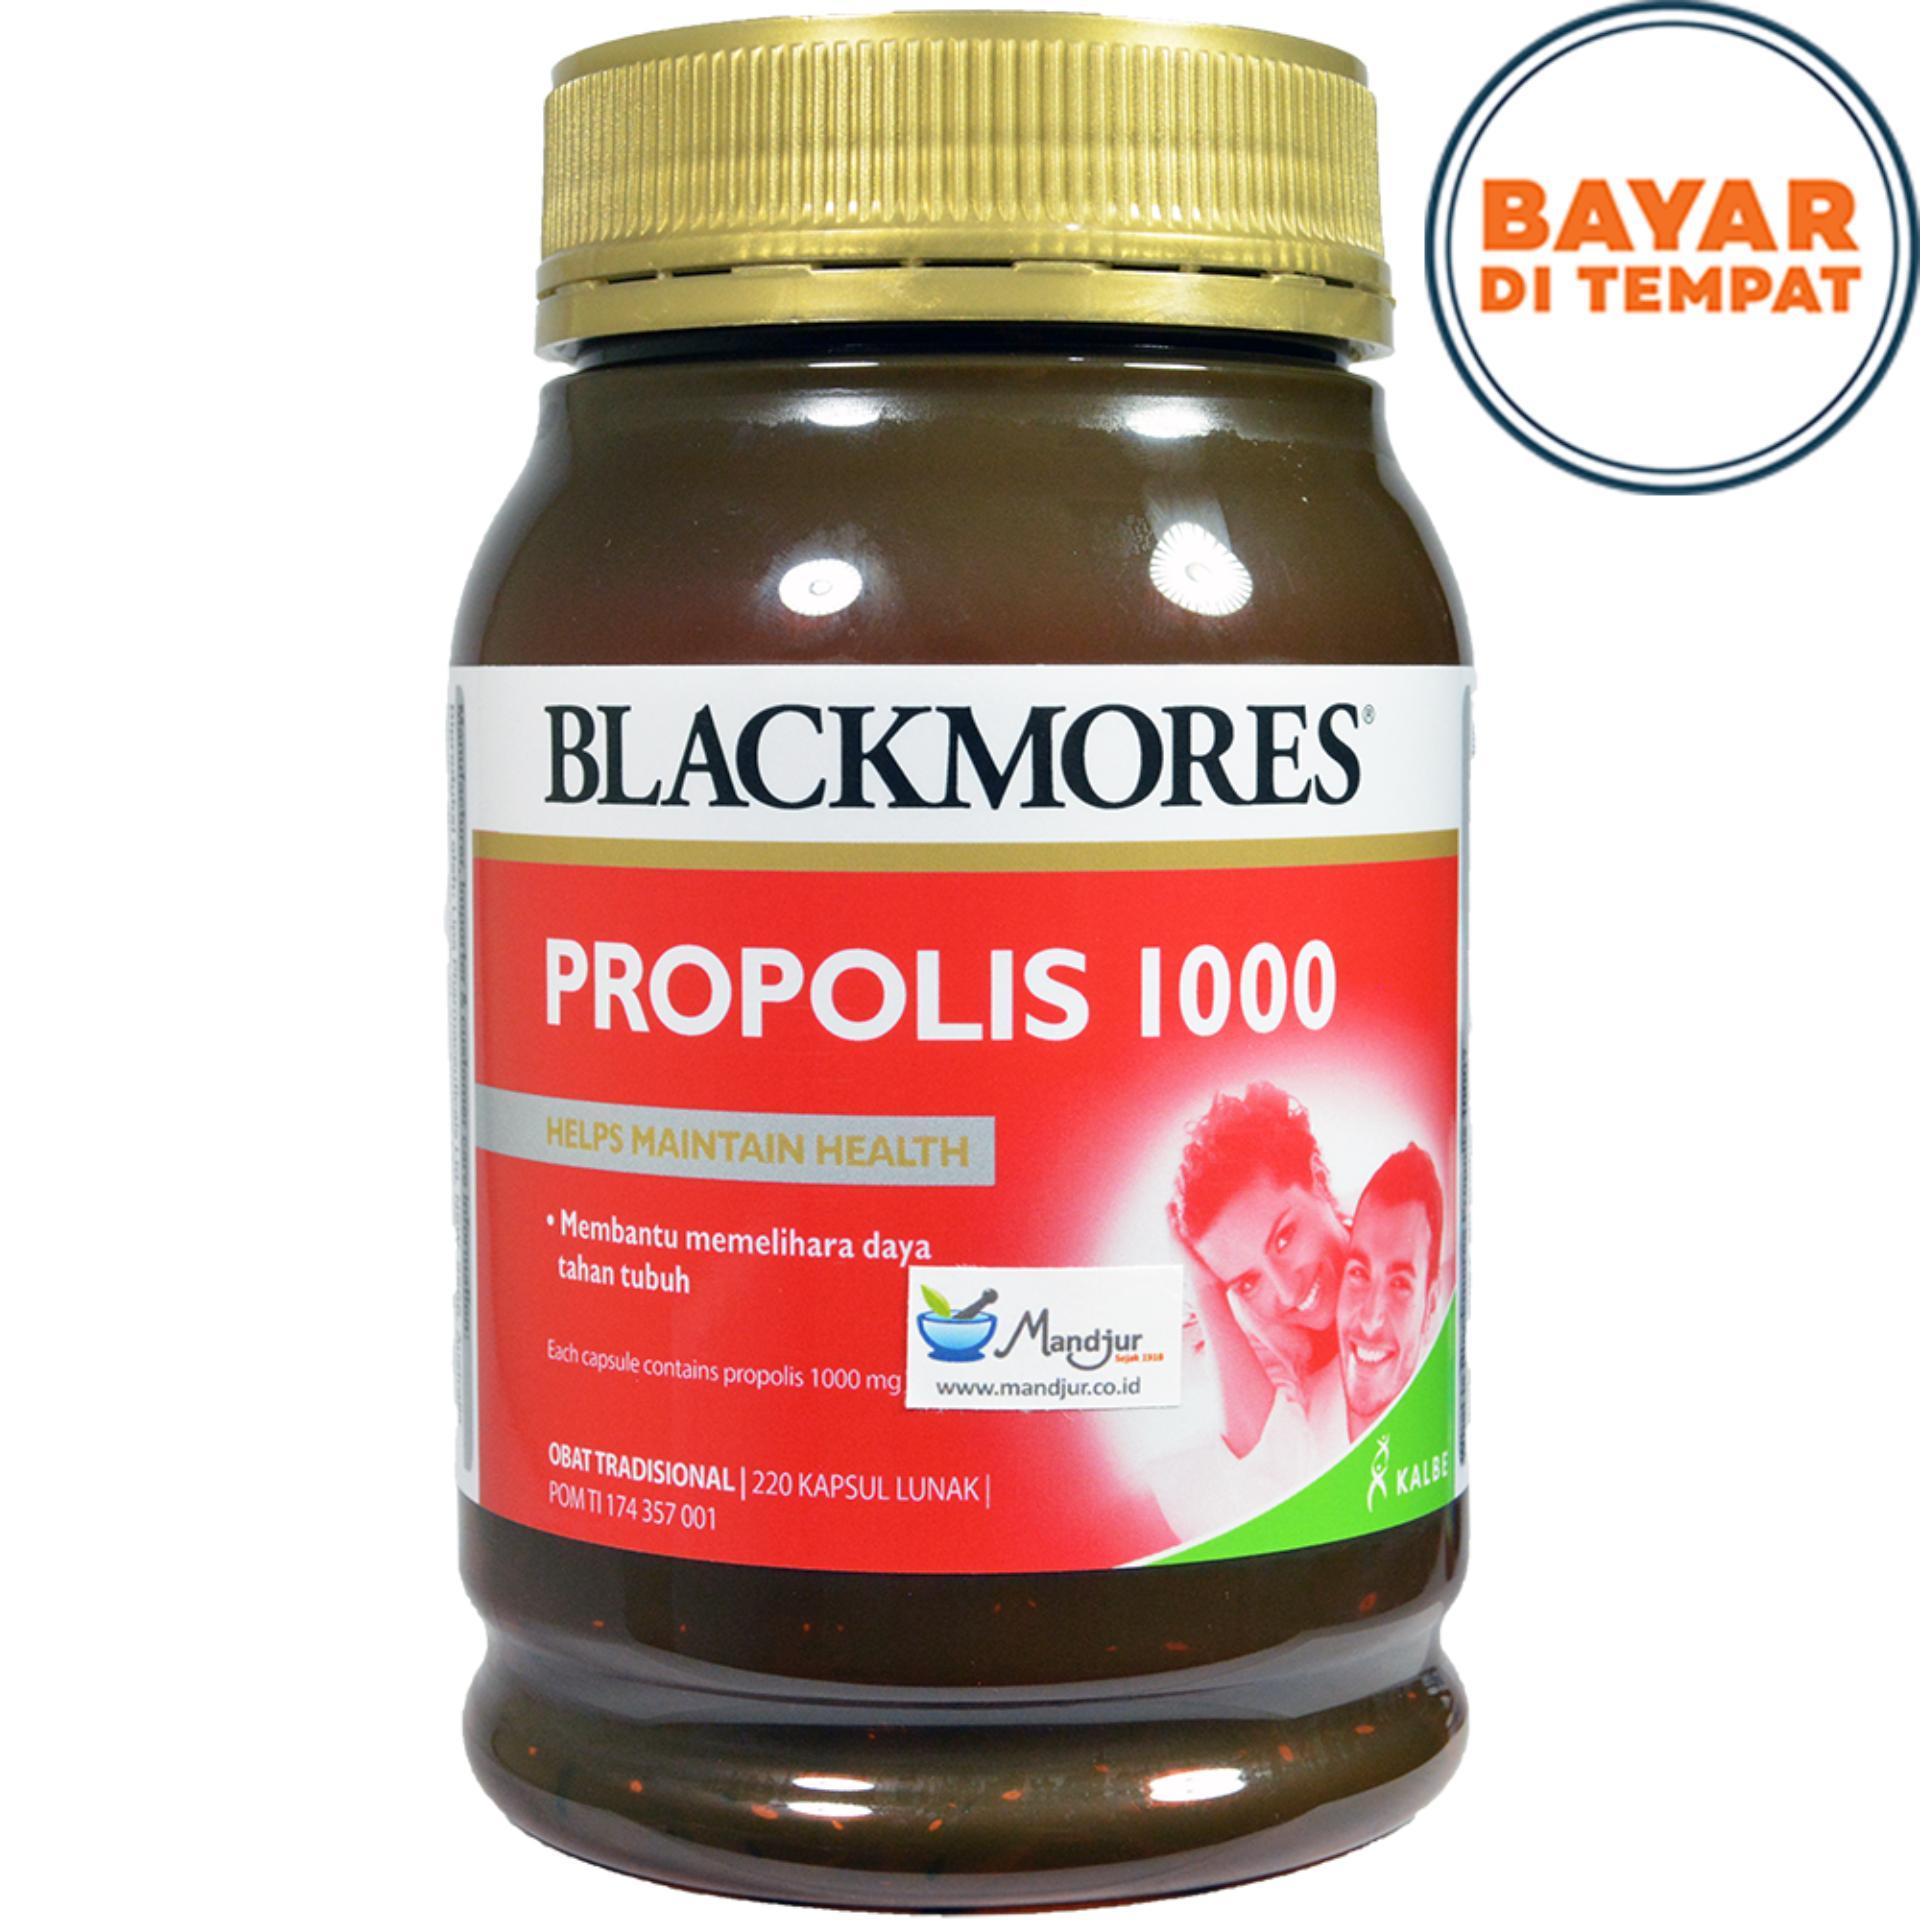 Toko Blackmores Propolis 1000 Lengkap Indonesia